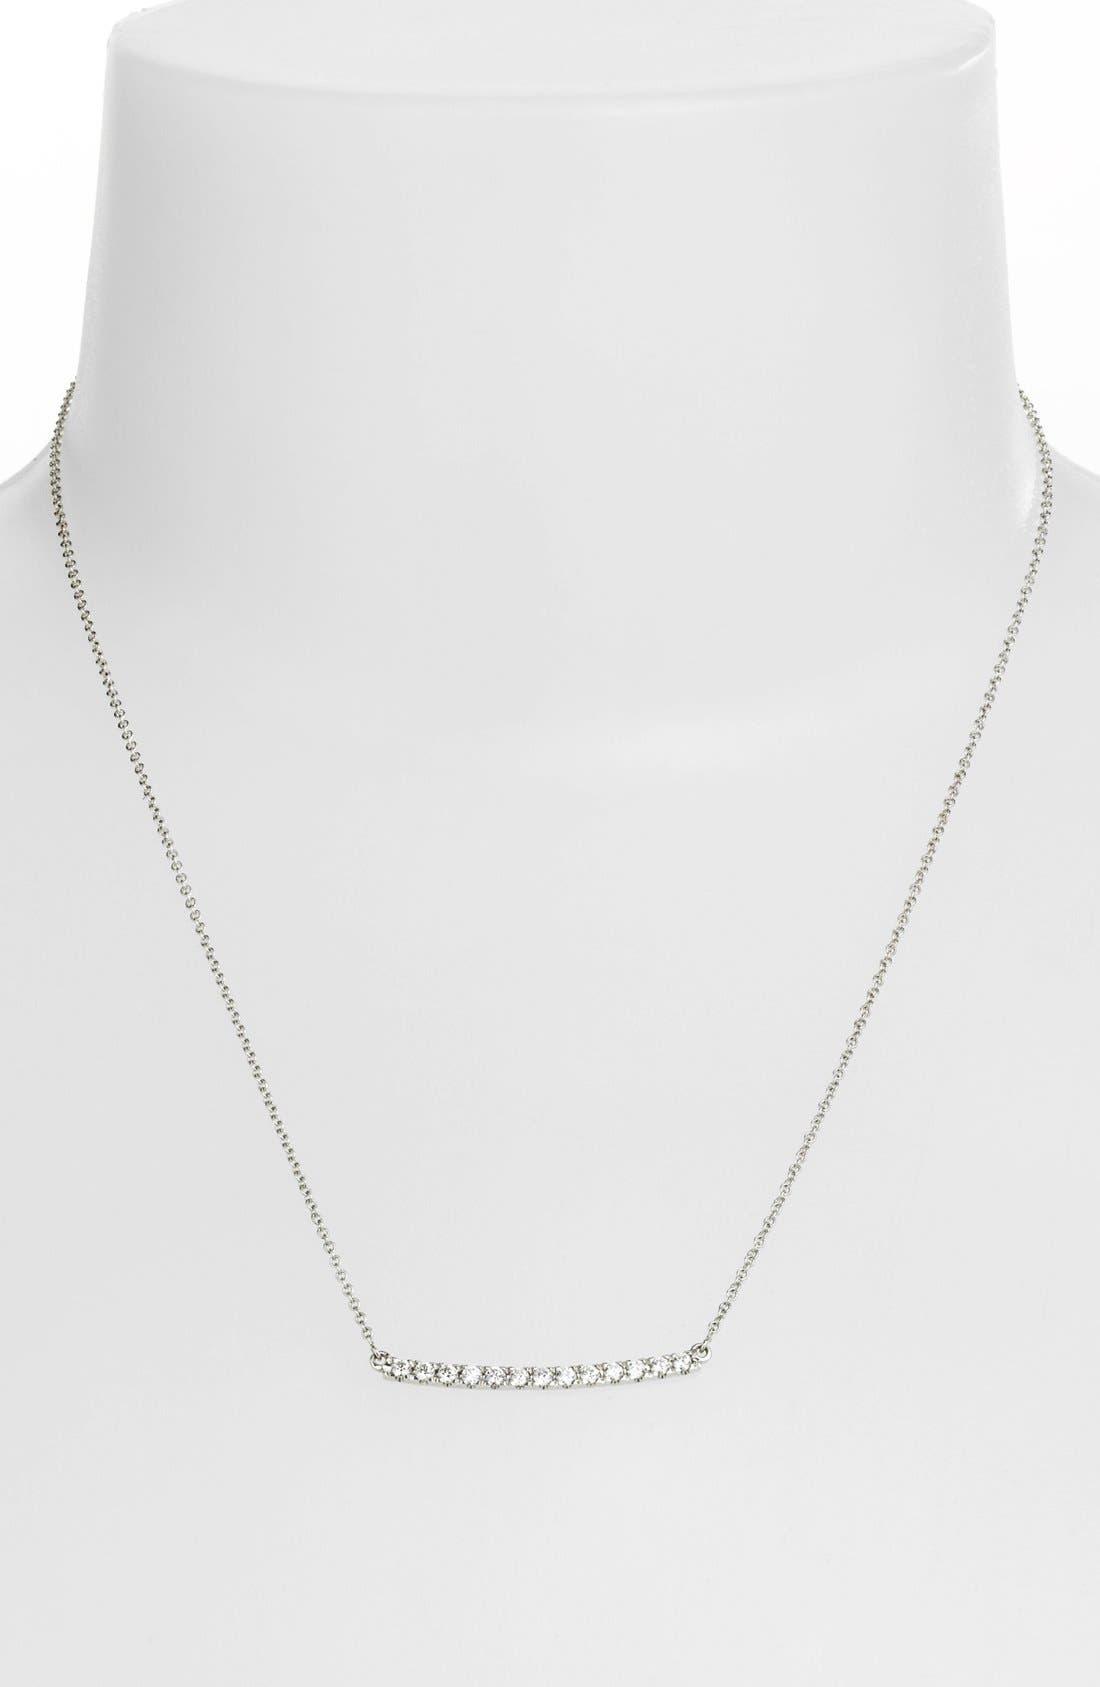 'Stick' Pavé Diamond Bar Necklace,                             Alternate thumbnail 2, color,                             White Gold